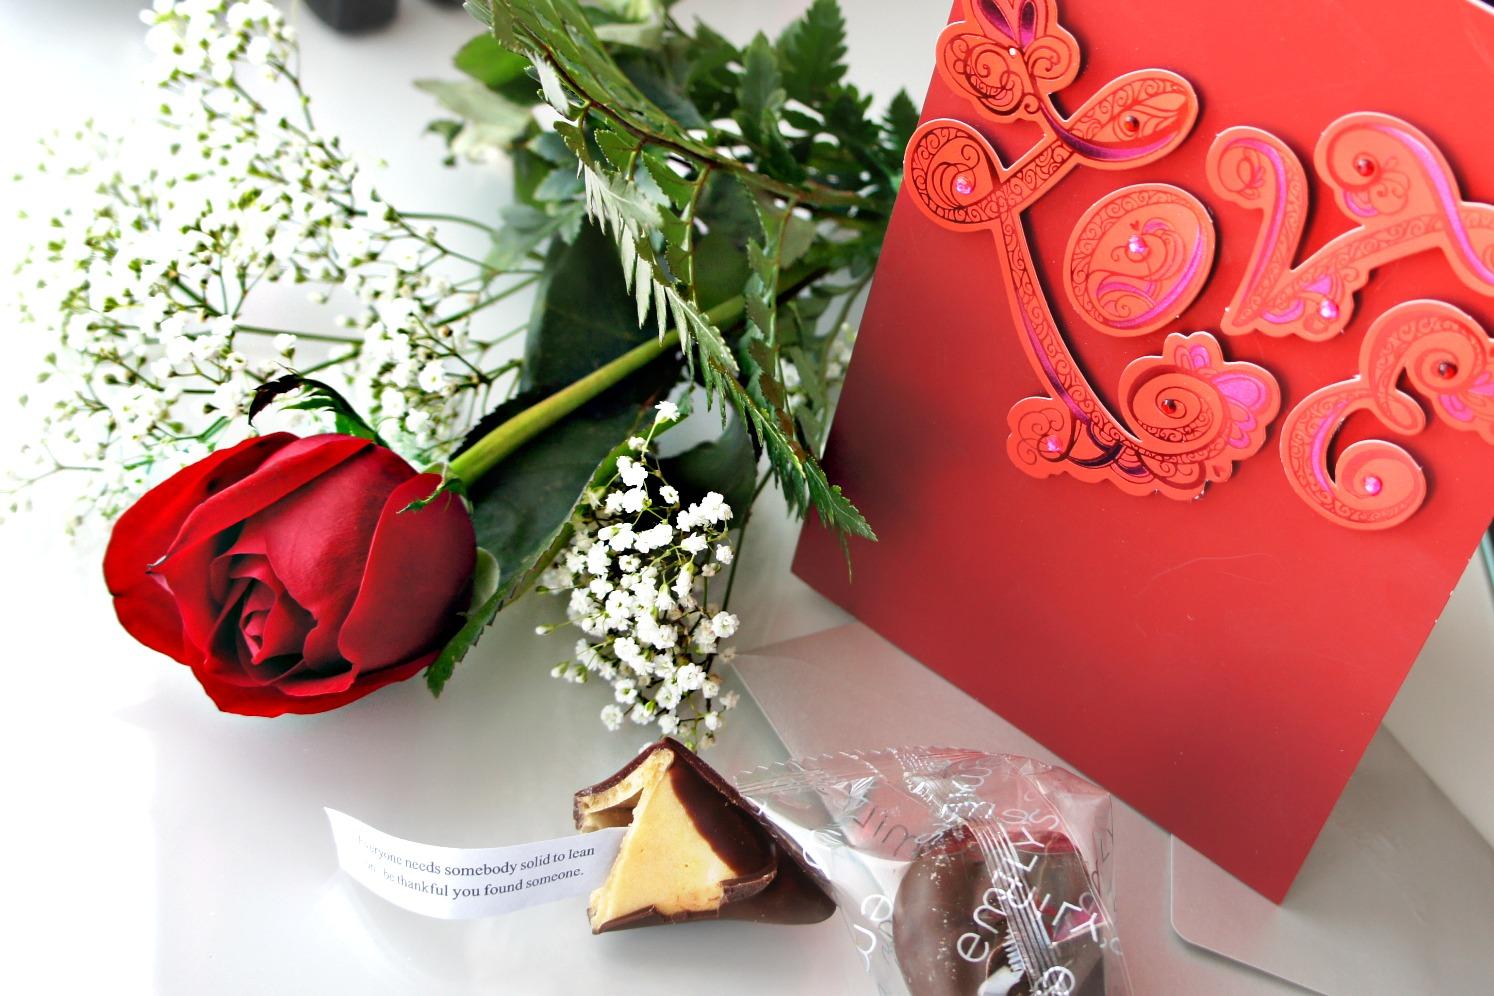 Belinda Selene Valentines Day Подарки на 14 февраля: беспроигрышные идеи